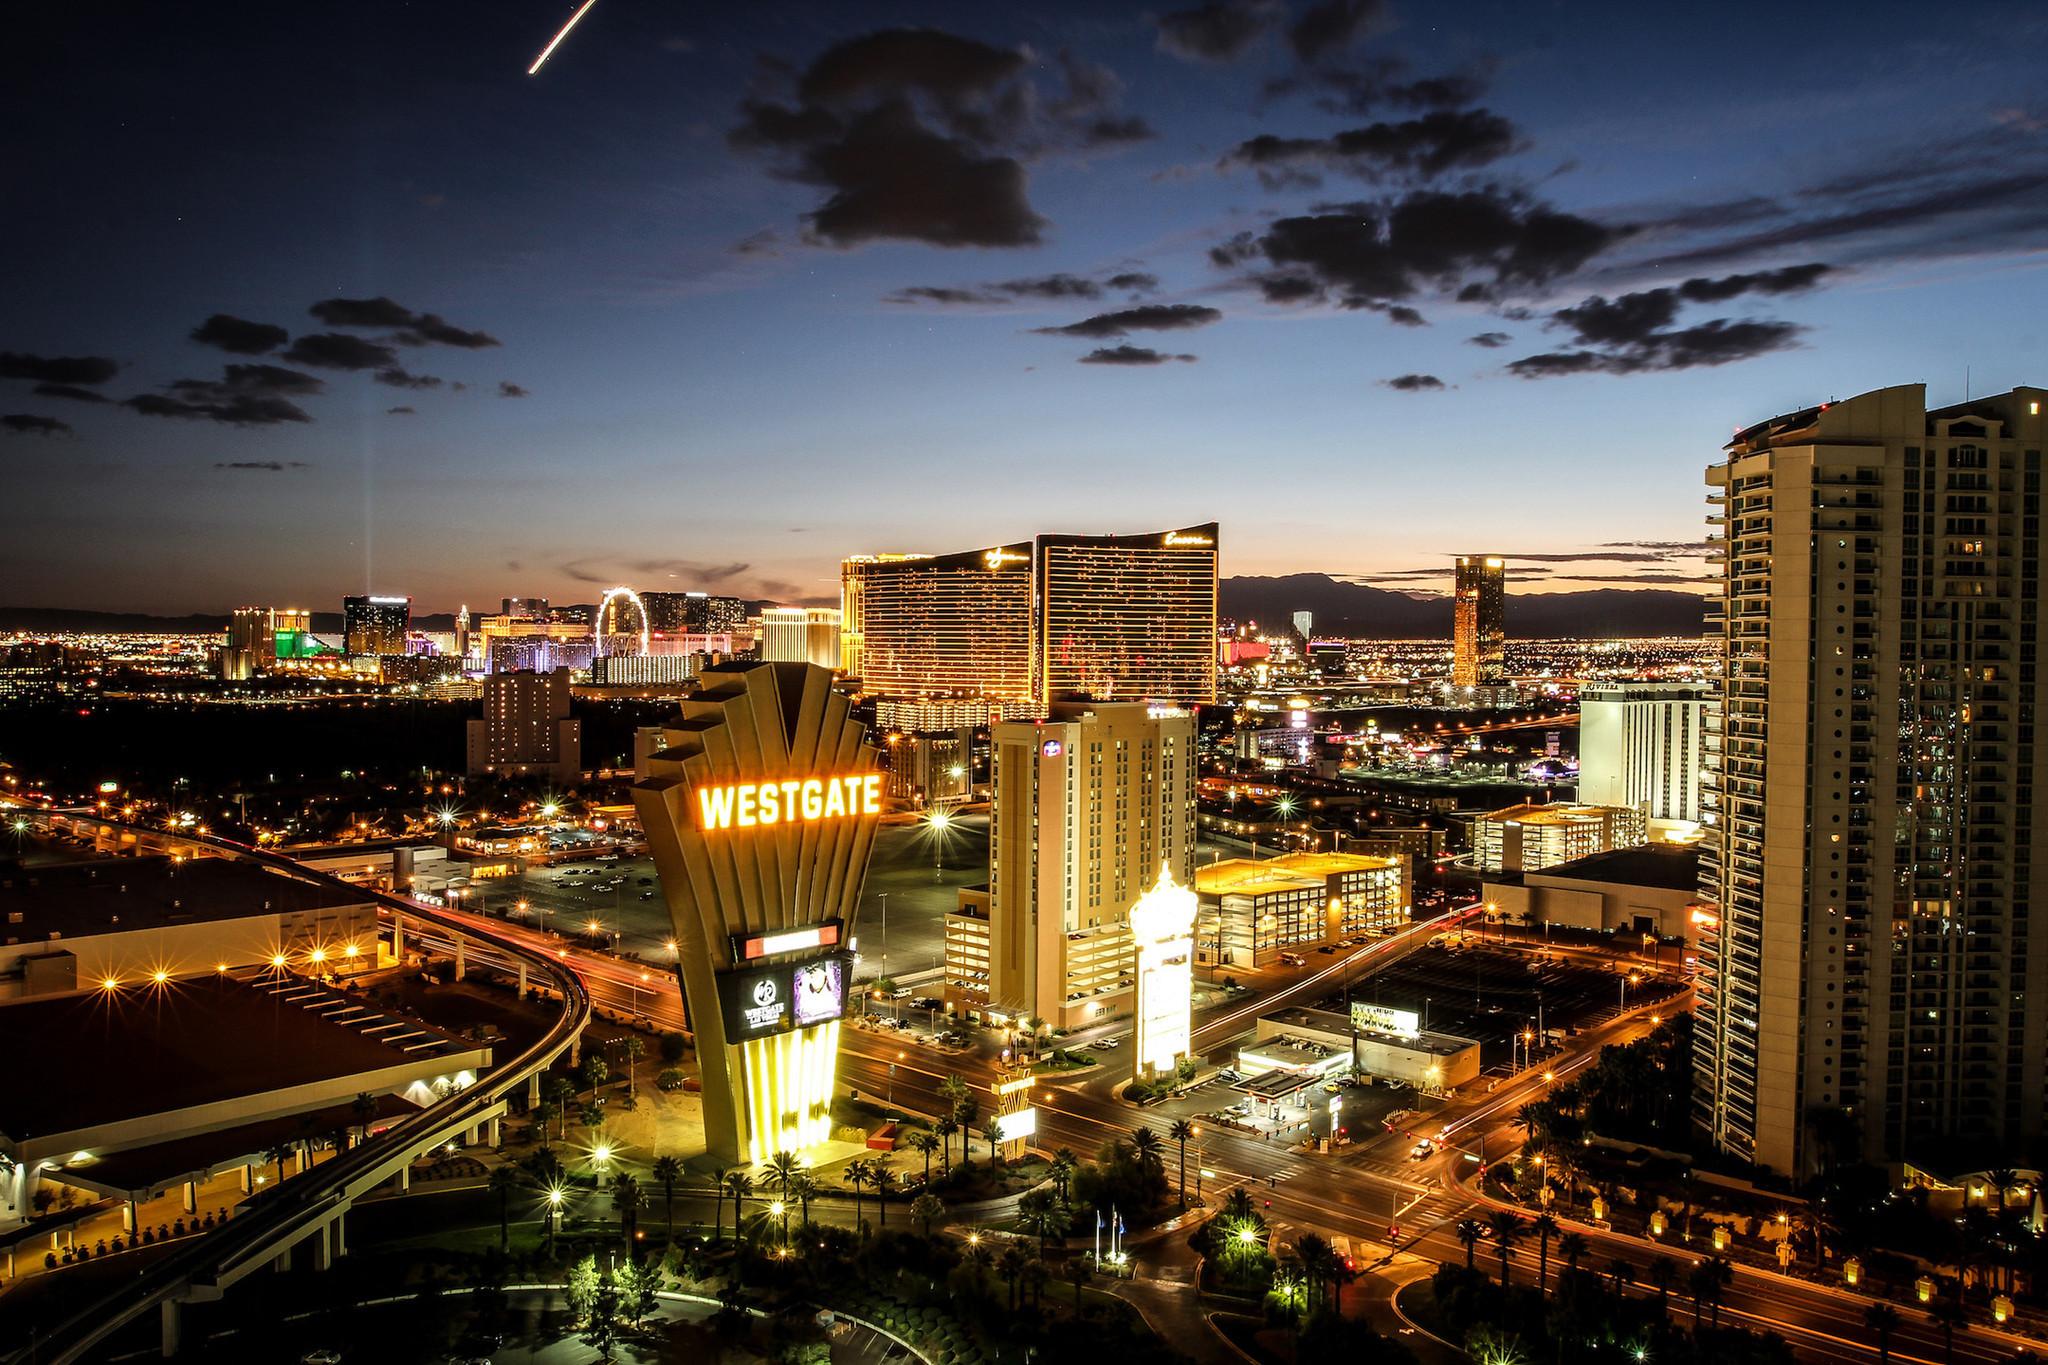 Hotel Westgate Las Vegas